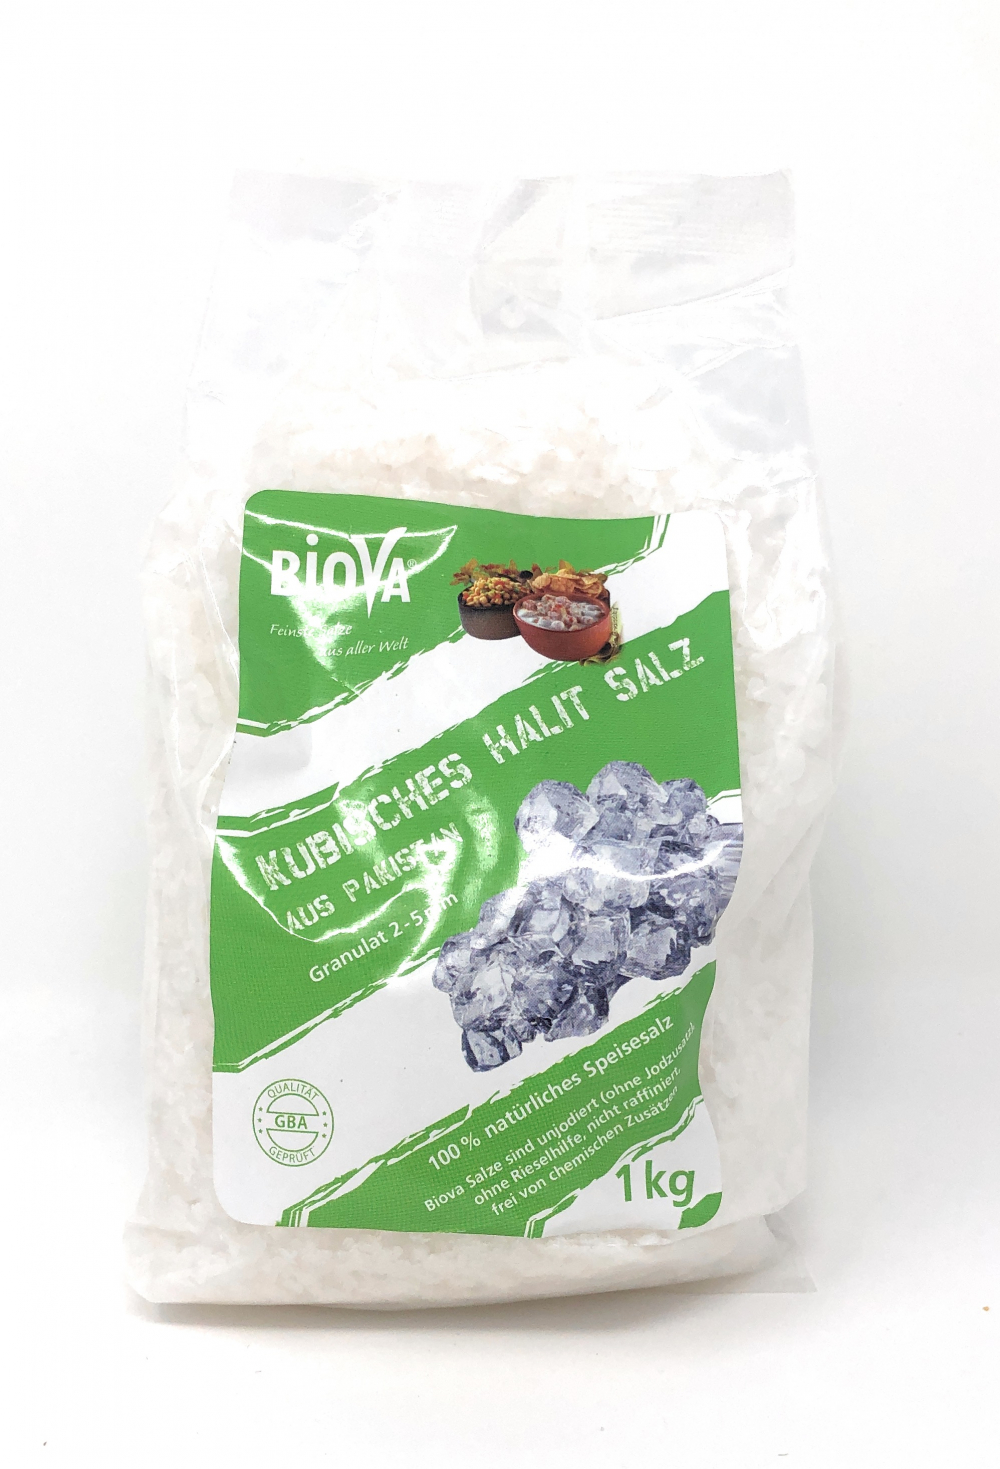 Biova Gourmetsalz Kubisches Halitsalz Granulat 2-5mm (aus Pakistan) 1kg Beutel